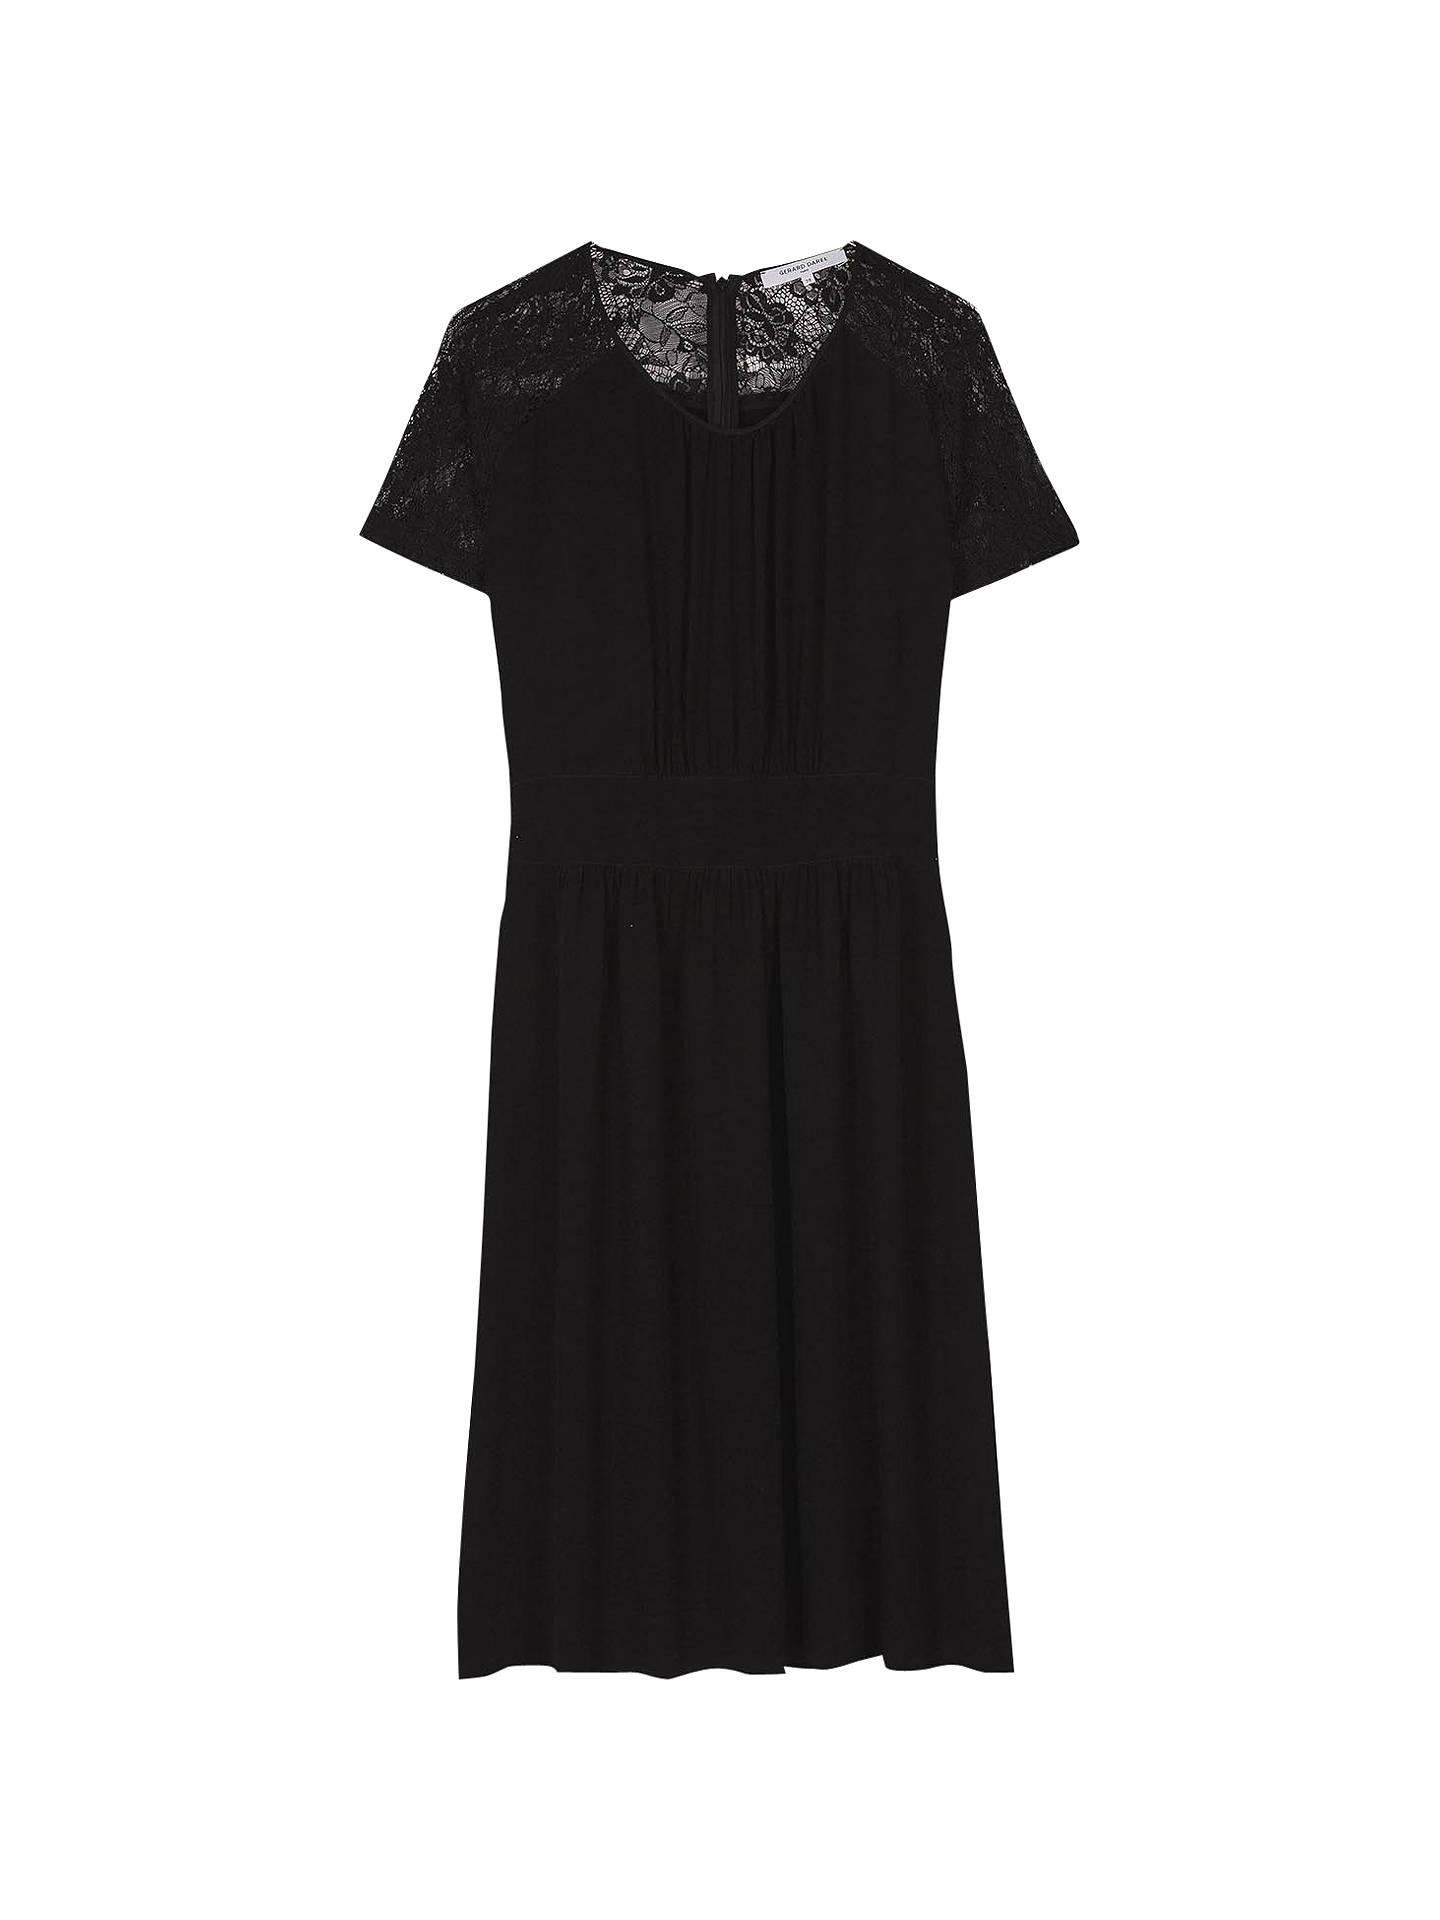 4d95549e0c4 Buy Gerard Darel Lace Robe Dress